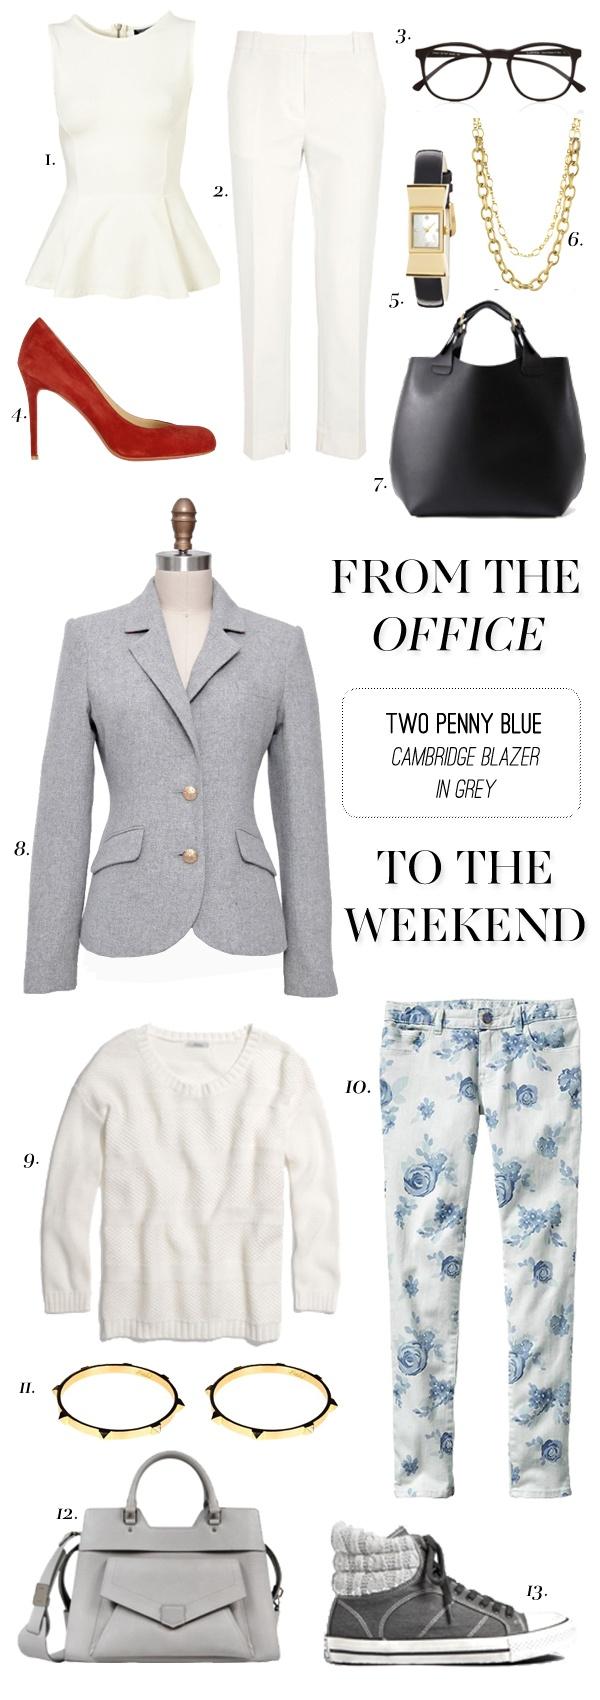 BLOG POST // office to weekend look // grey cambridge blazer // grey blazer red pump peplum top black frame glasses floral skinnies spike bangles // via blog.2pennyblue.com